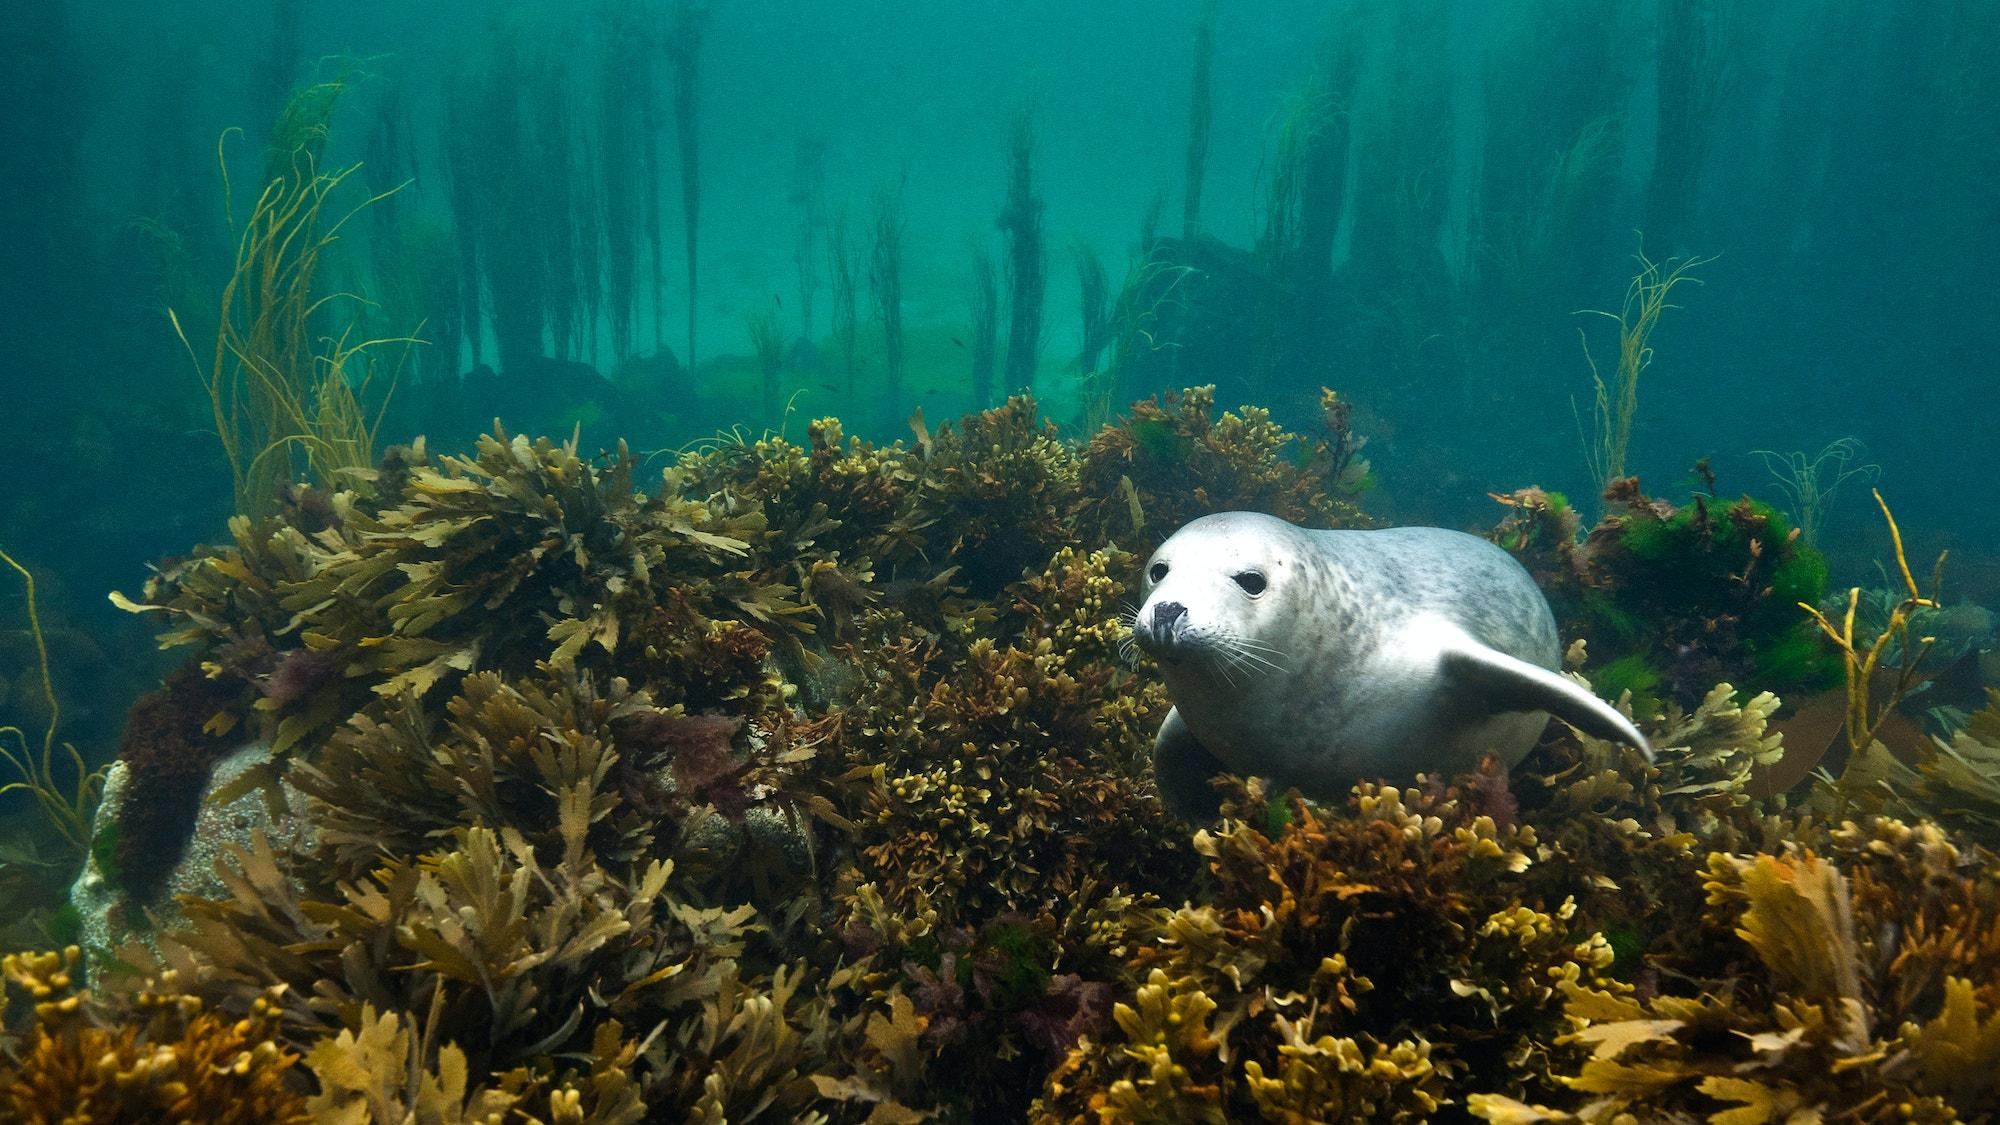 Seal kelp SBP Alexander Mustard